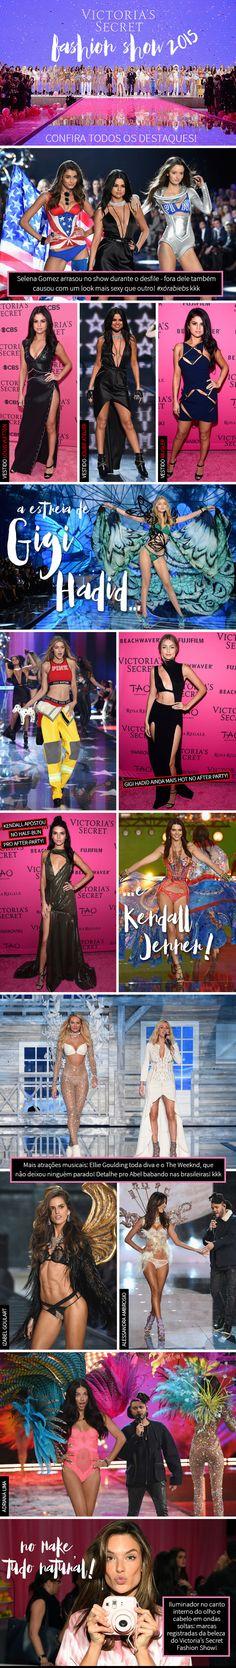 Victoria's Secret Fashion Show 2015: os looks e lingeries de Alessandra Ambrosio, Gigi Hadid, Kendall Jenner, Adriana Lima e mais Angels!